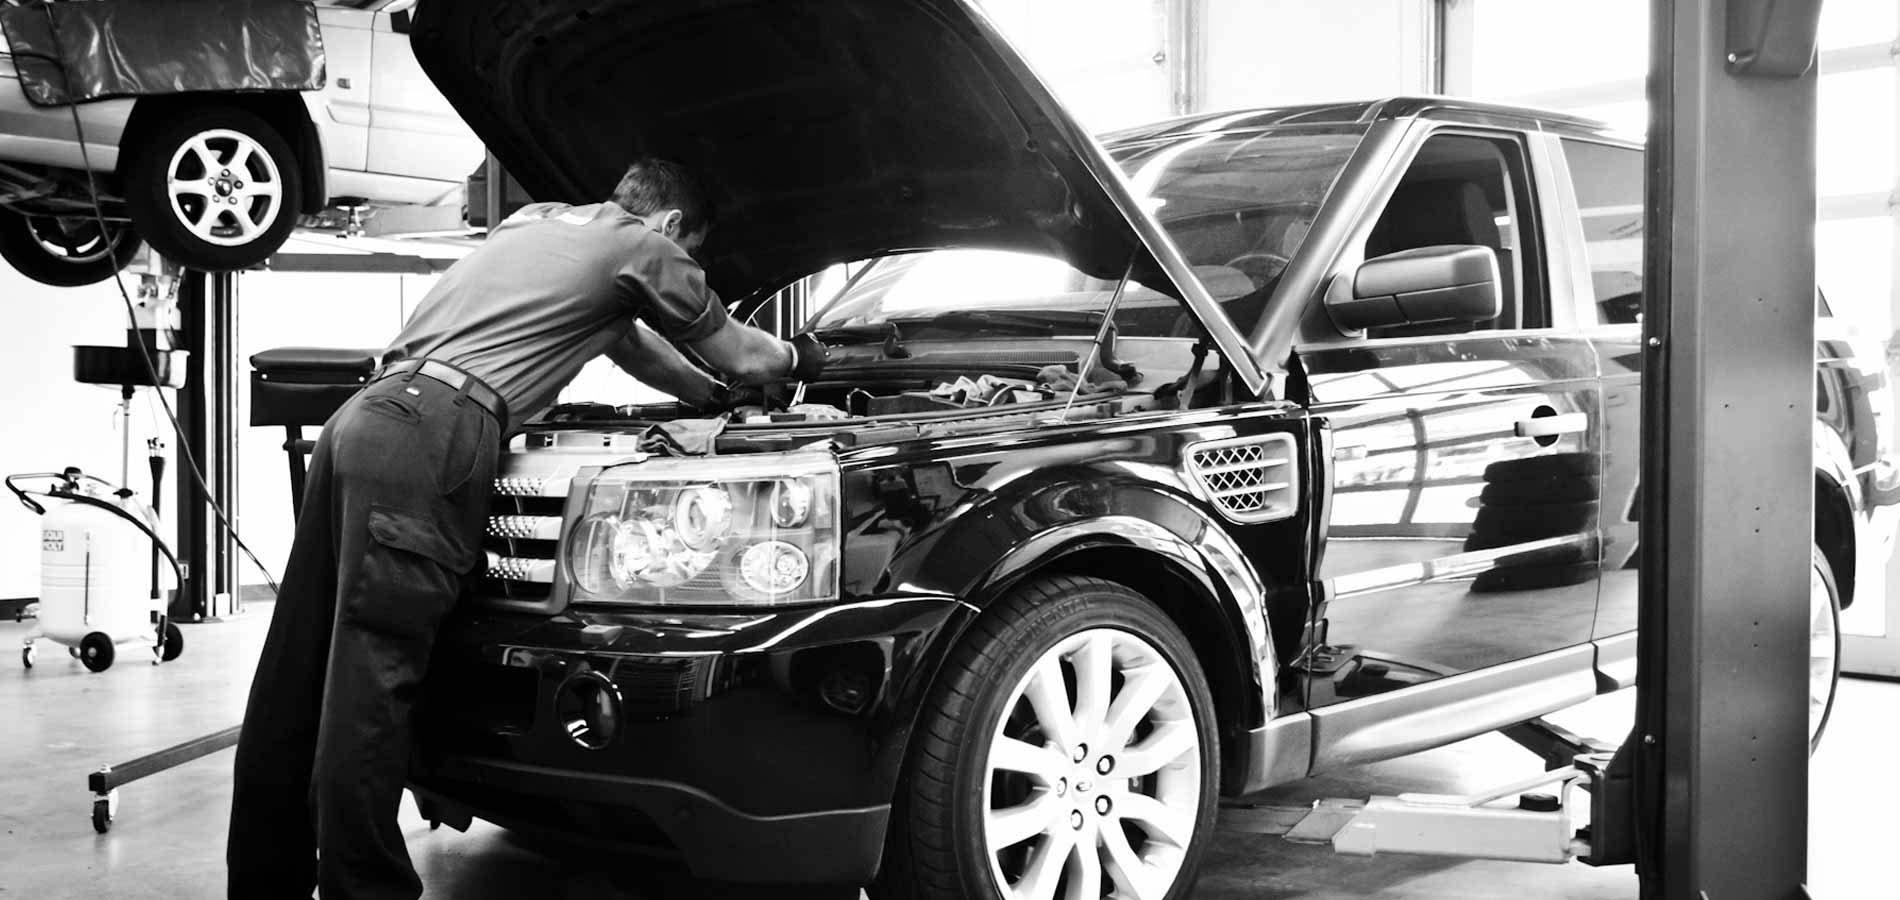 Land Rover Kelowna >> Motor Werke Kelowna European Car Repair